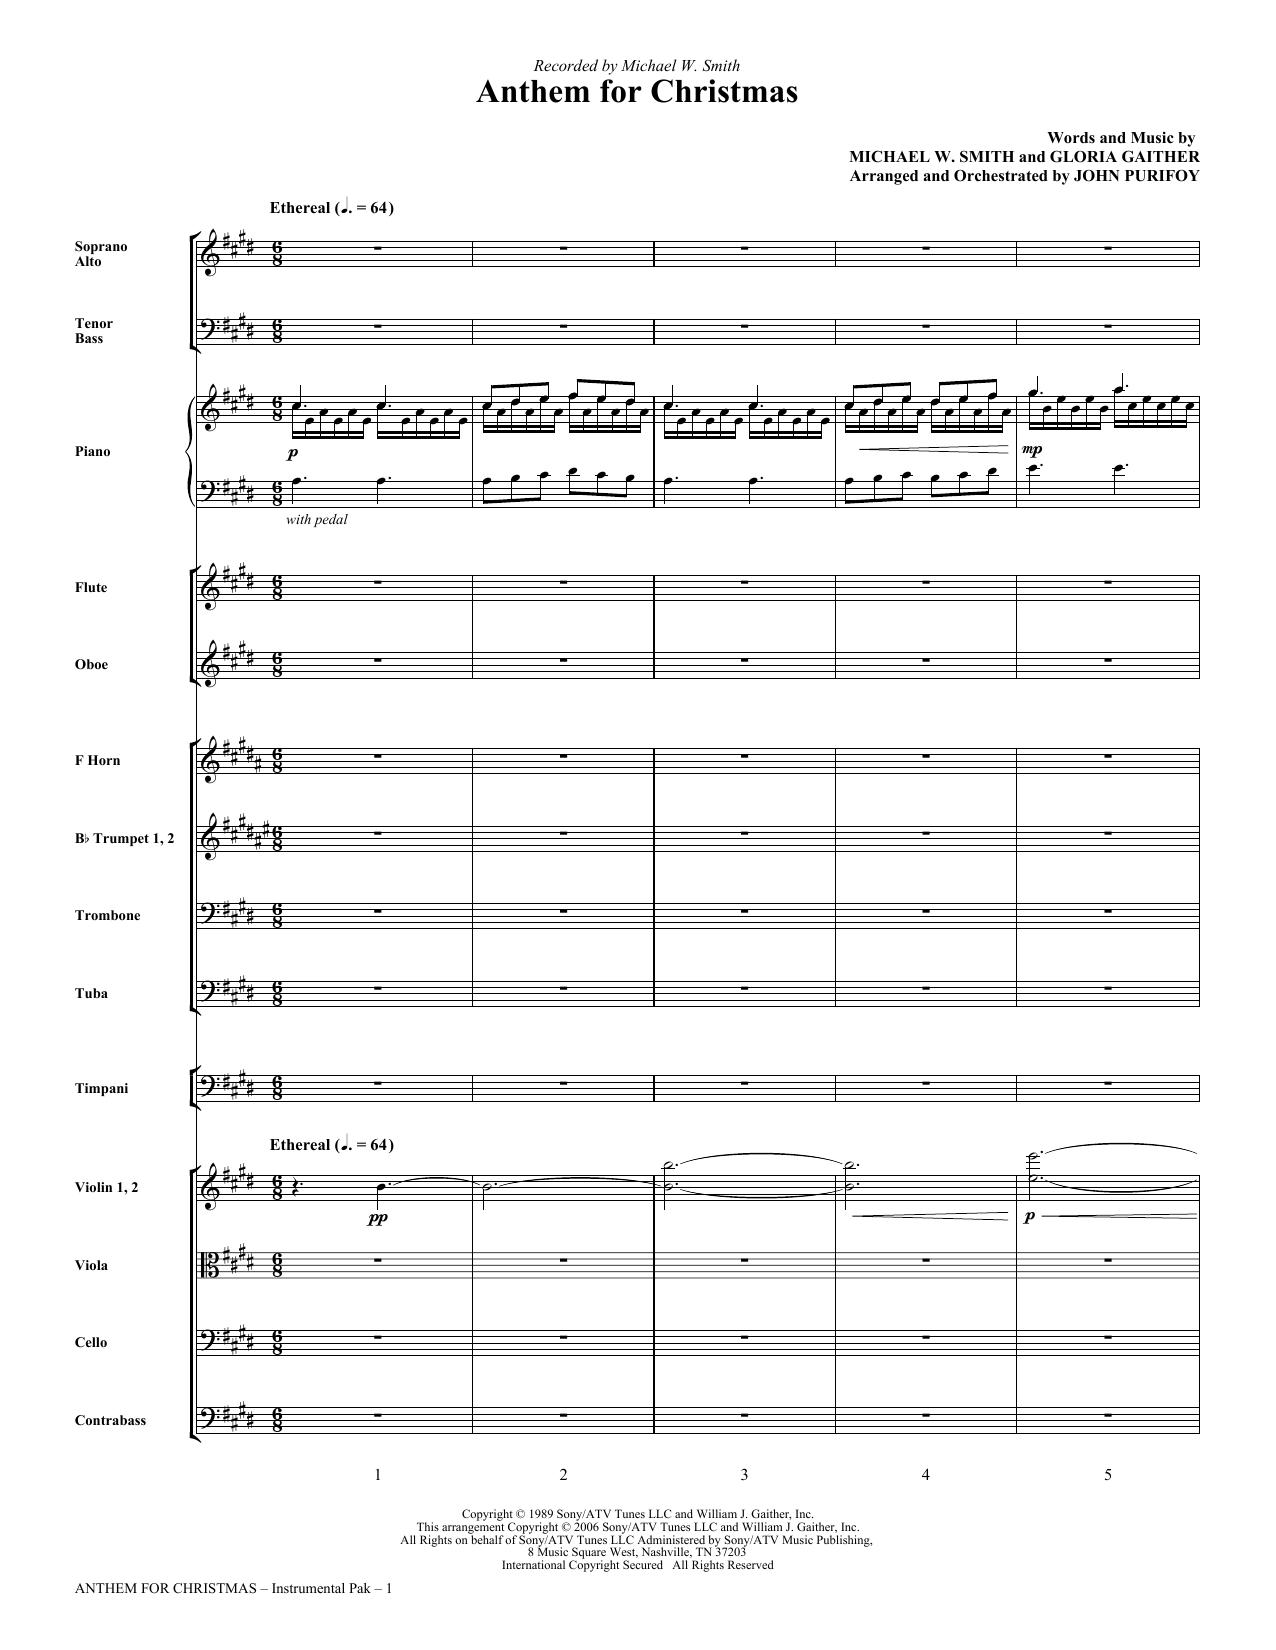 This Christmas Chords.John Purifoy Anthem For Christmas Full Score Sheet Music Notes Chords Download Printable Choral Instrumental Pak Sku 266059